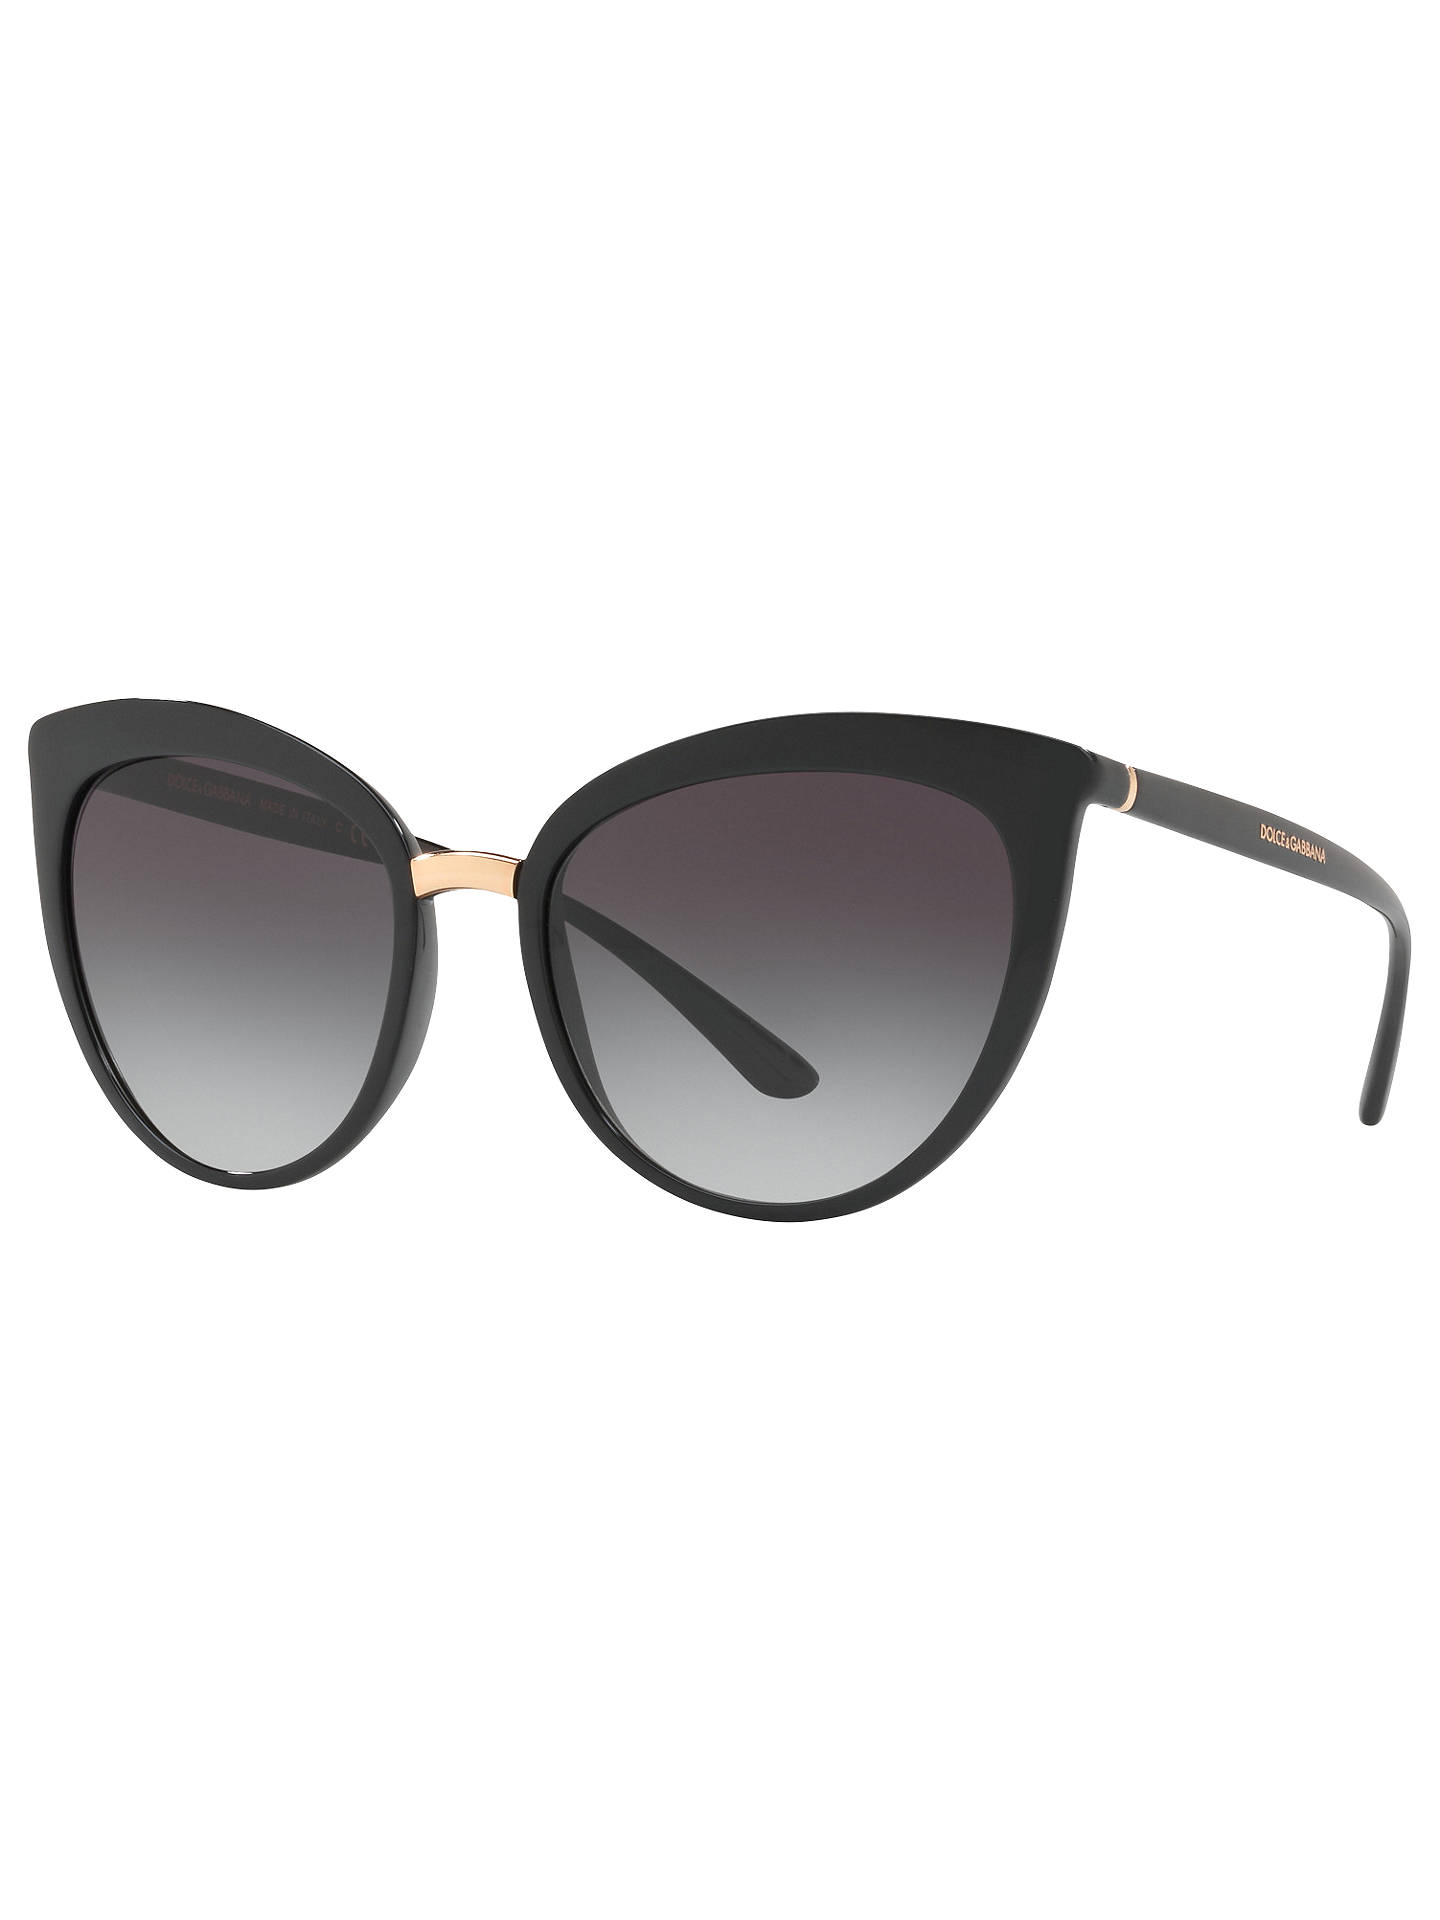 1a86ea301648 Buy Dolce & Gabbana DG6113 Cat's Eye Sunglasses, Black/Grey Gradient Online  at johnlewis ...